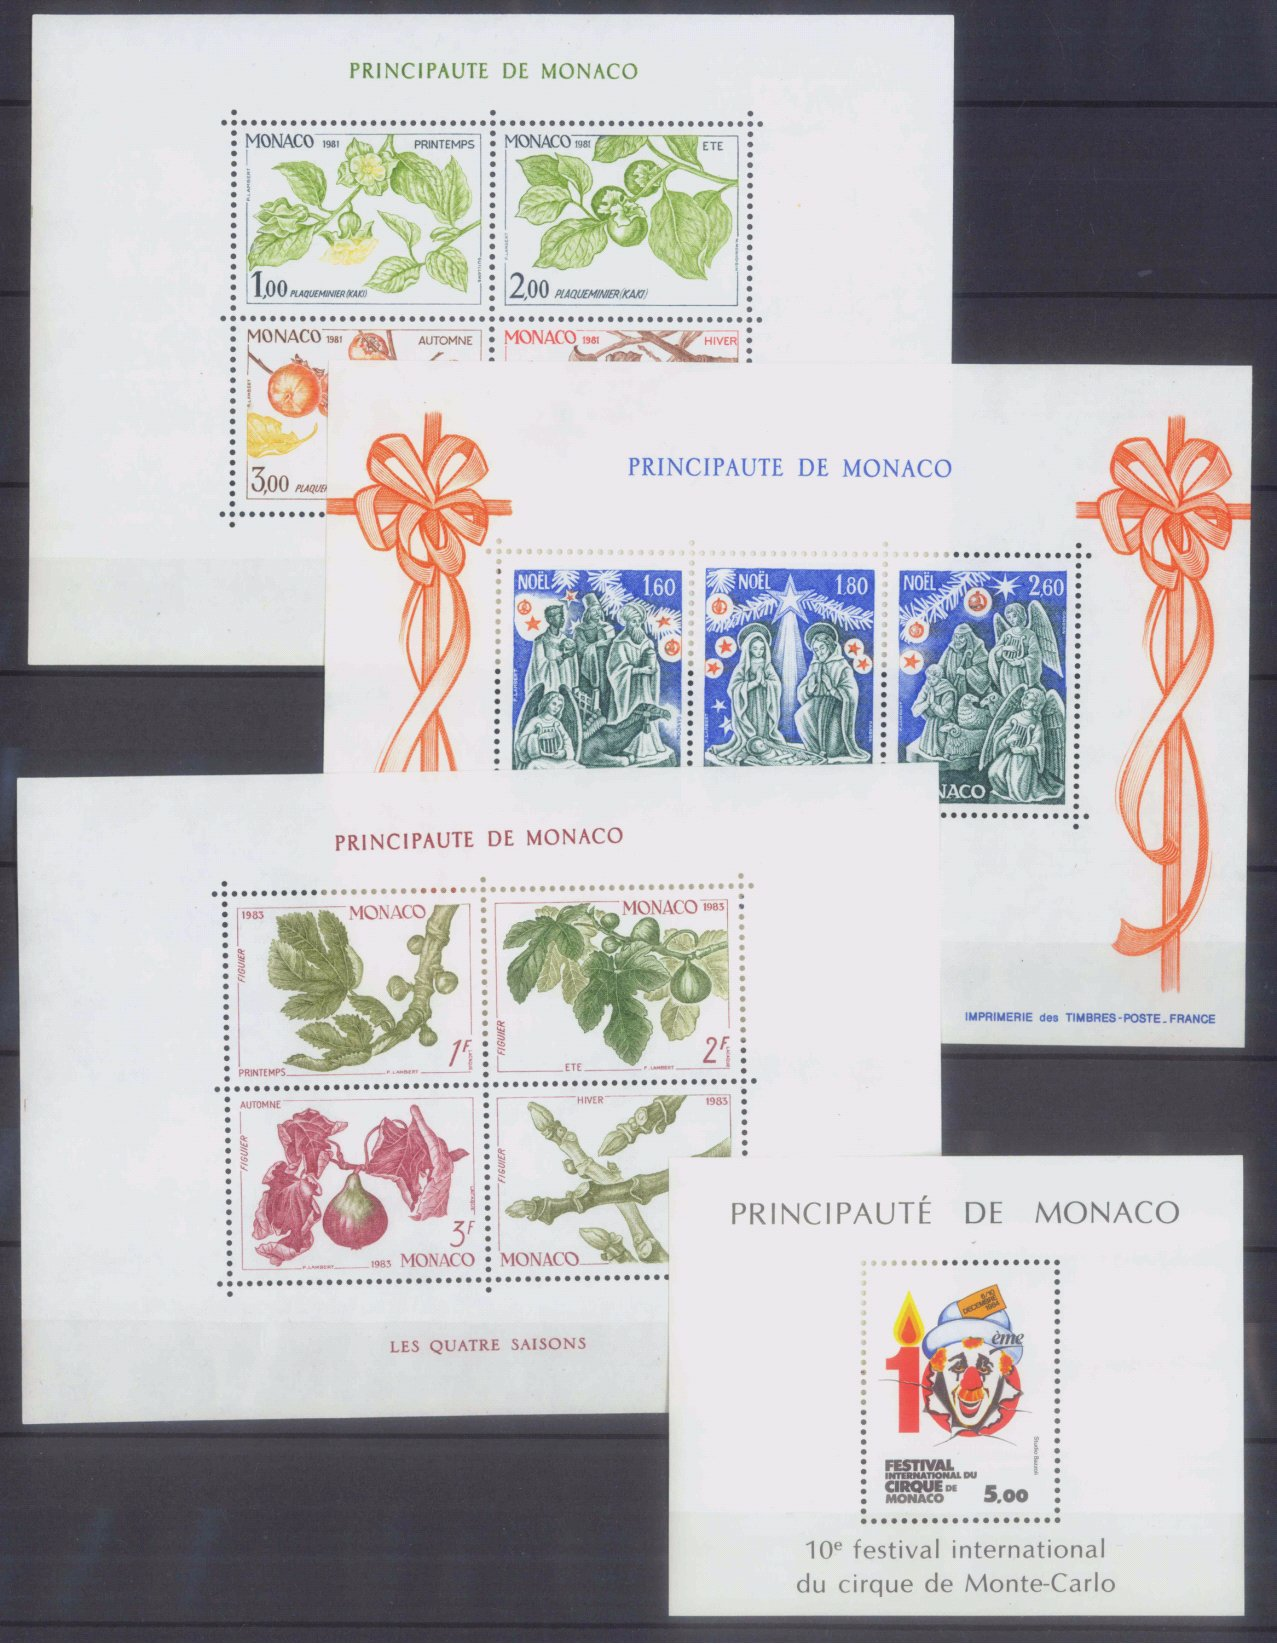 MONACO 1953-1989, Katalogwert 970,- Euro-4